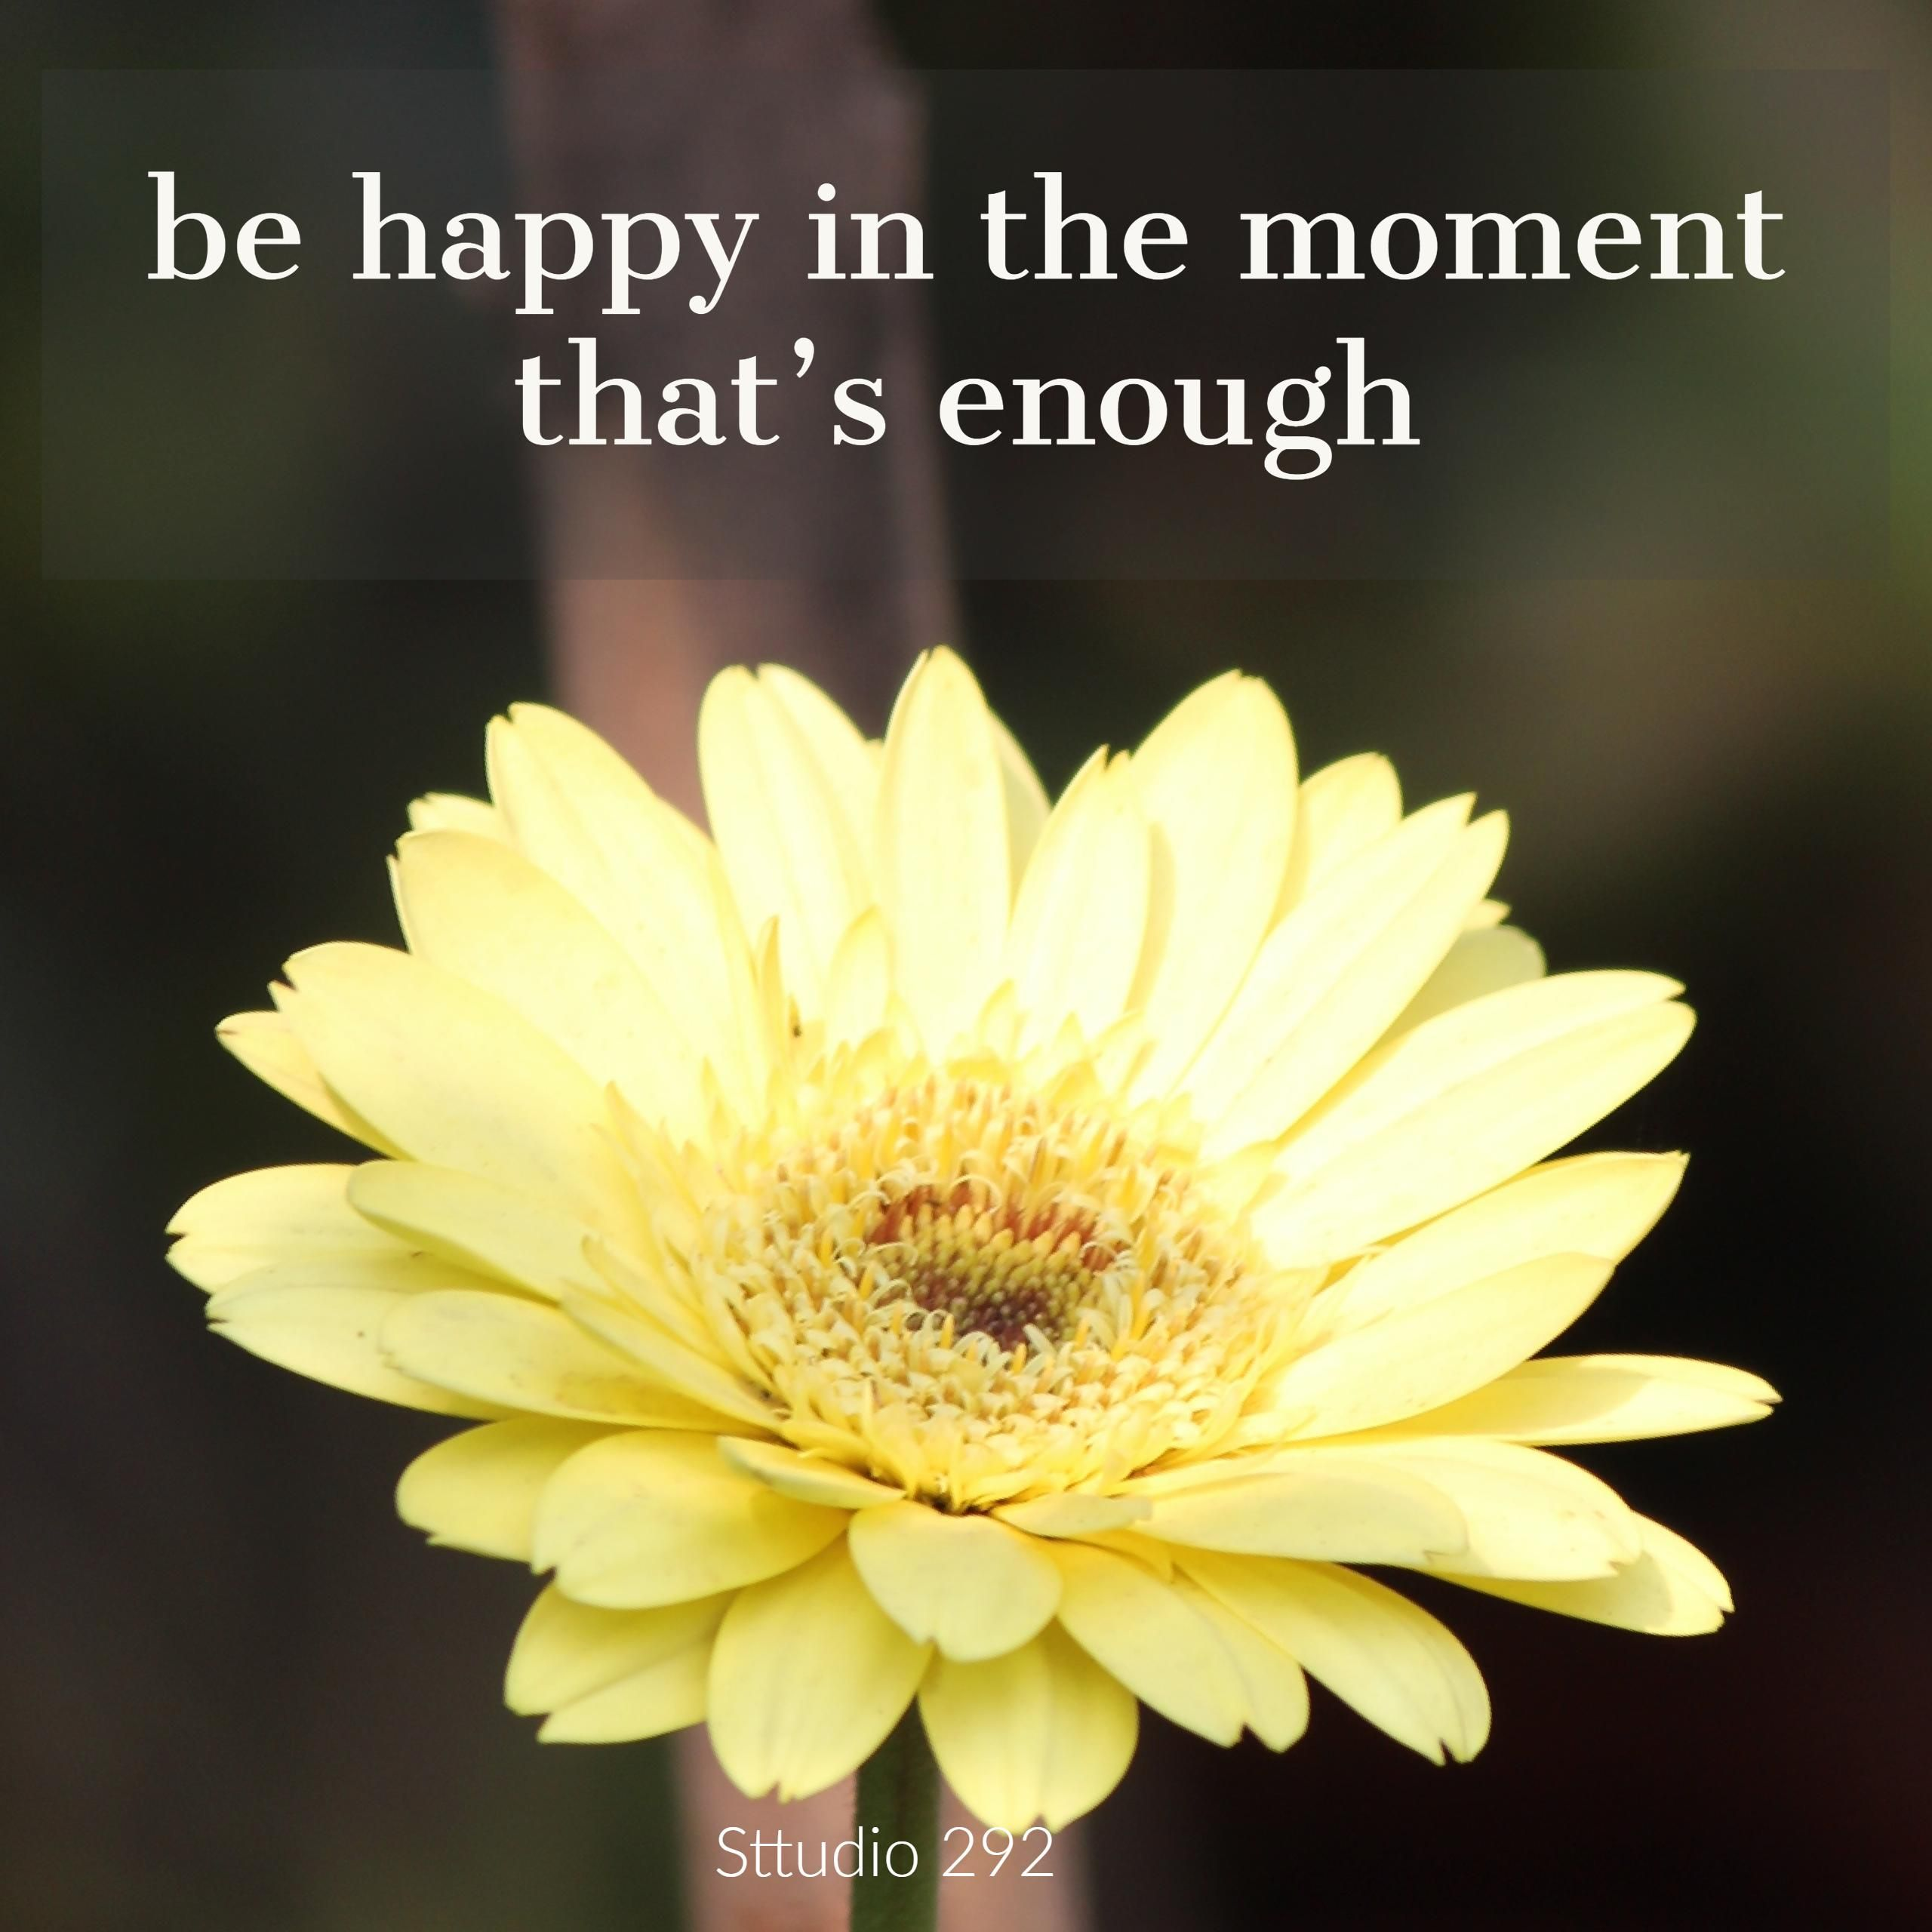 Beautiful yellow gerbera daisy flower quotes on happiness with beautiful yellow gerbera daisy flower happiness quotes happy quotes yellow springs winter flowers mightylinksfo